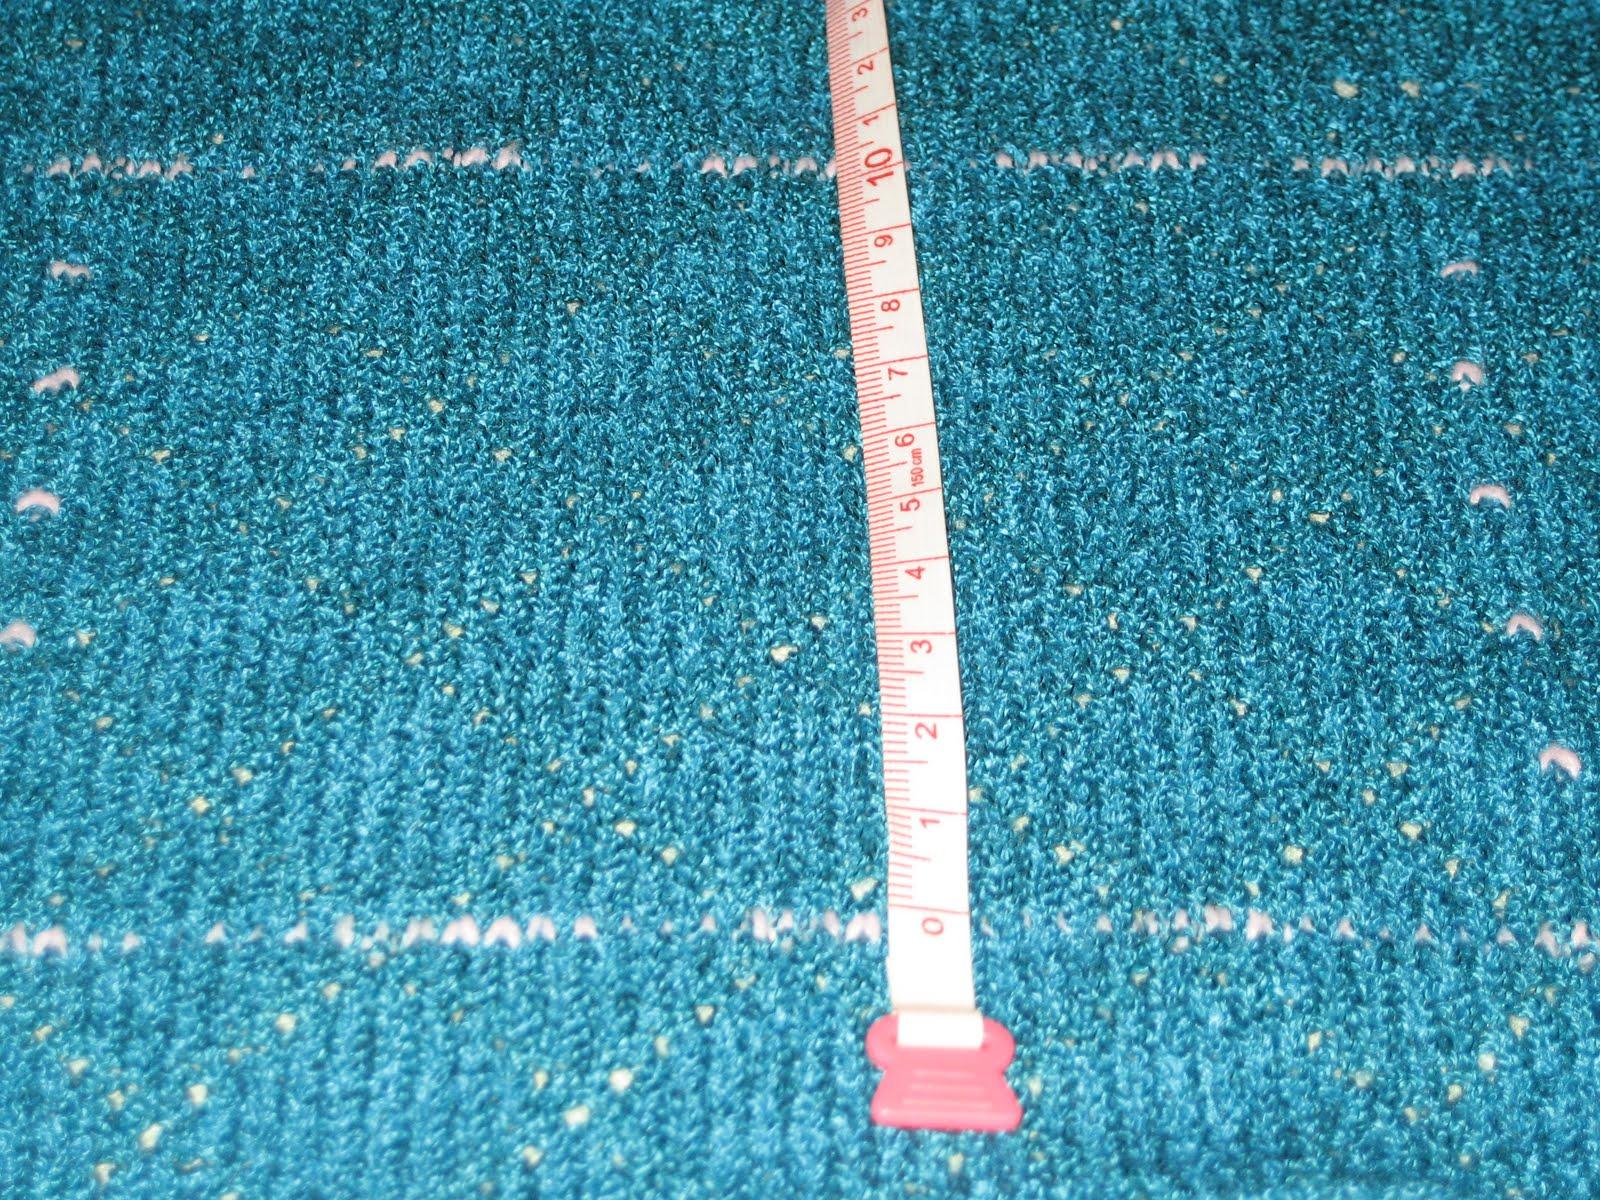 Knitting Gauge Calculator : How to measure gauge knitting